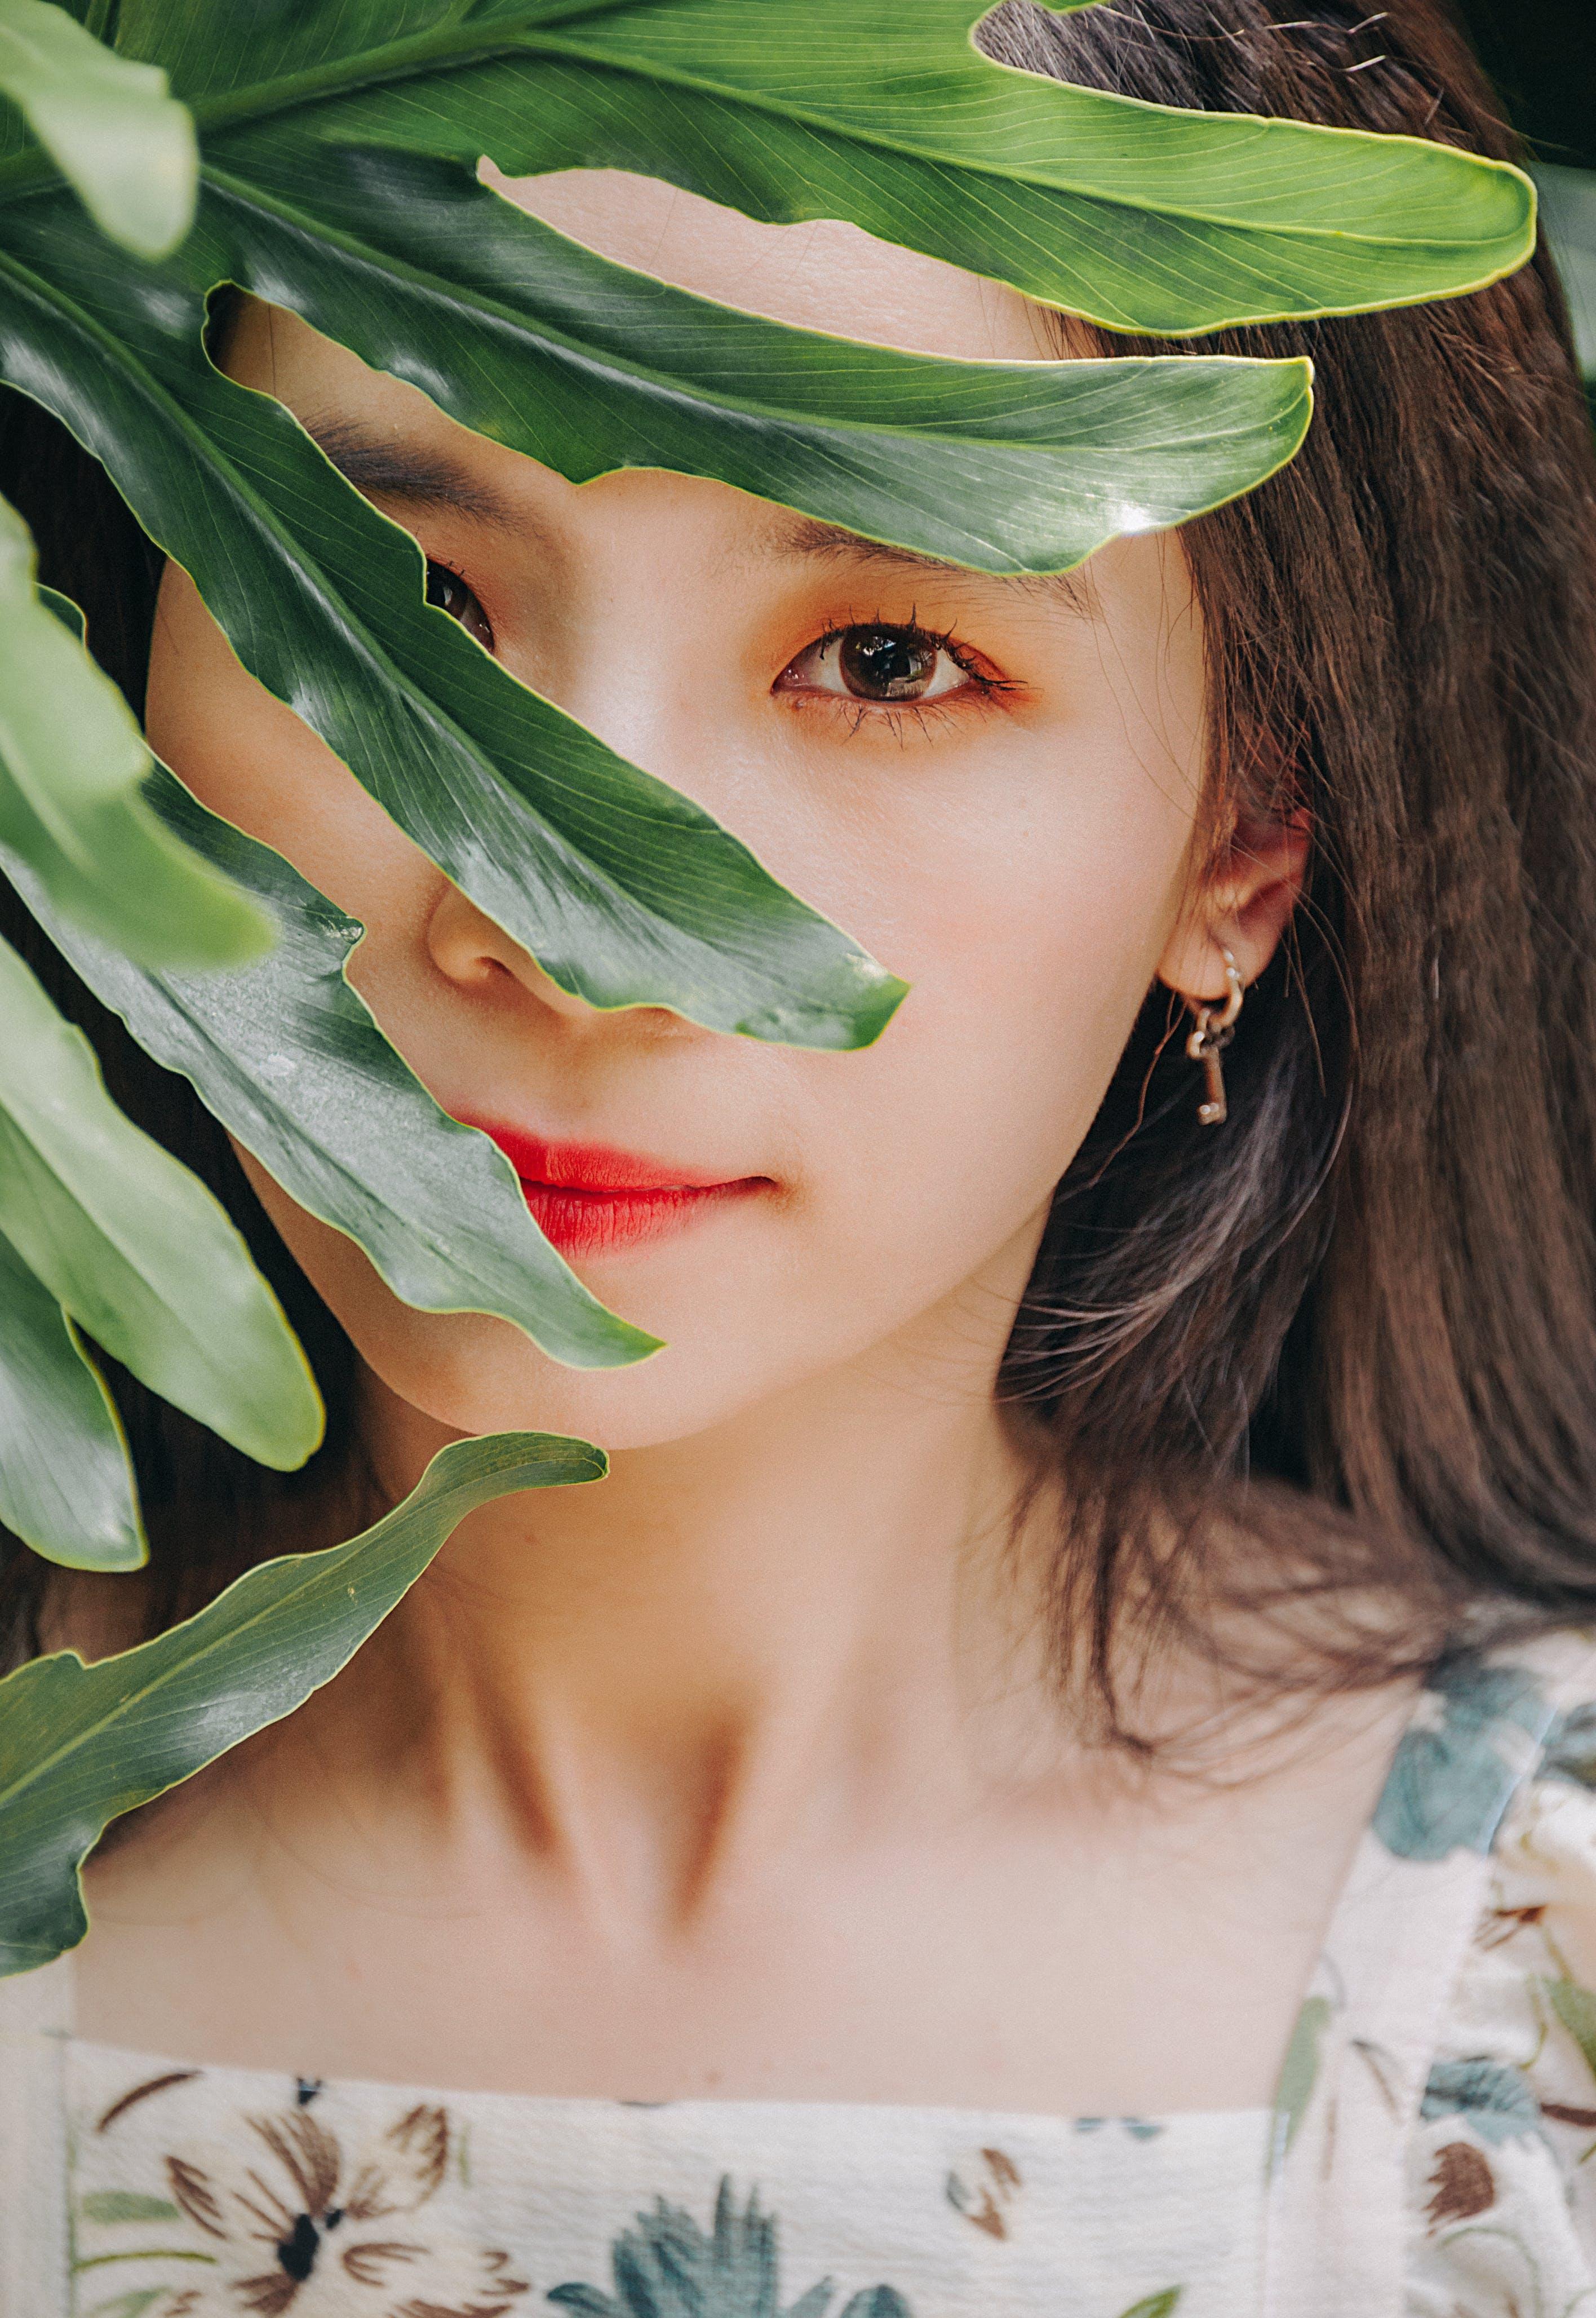 Woman Posing Behind Plant